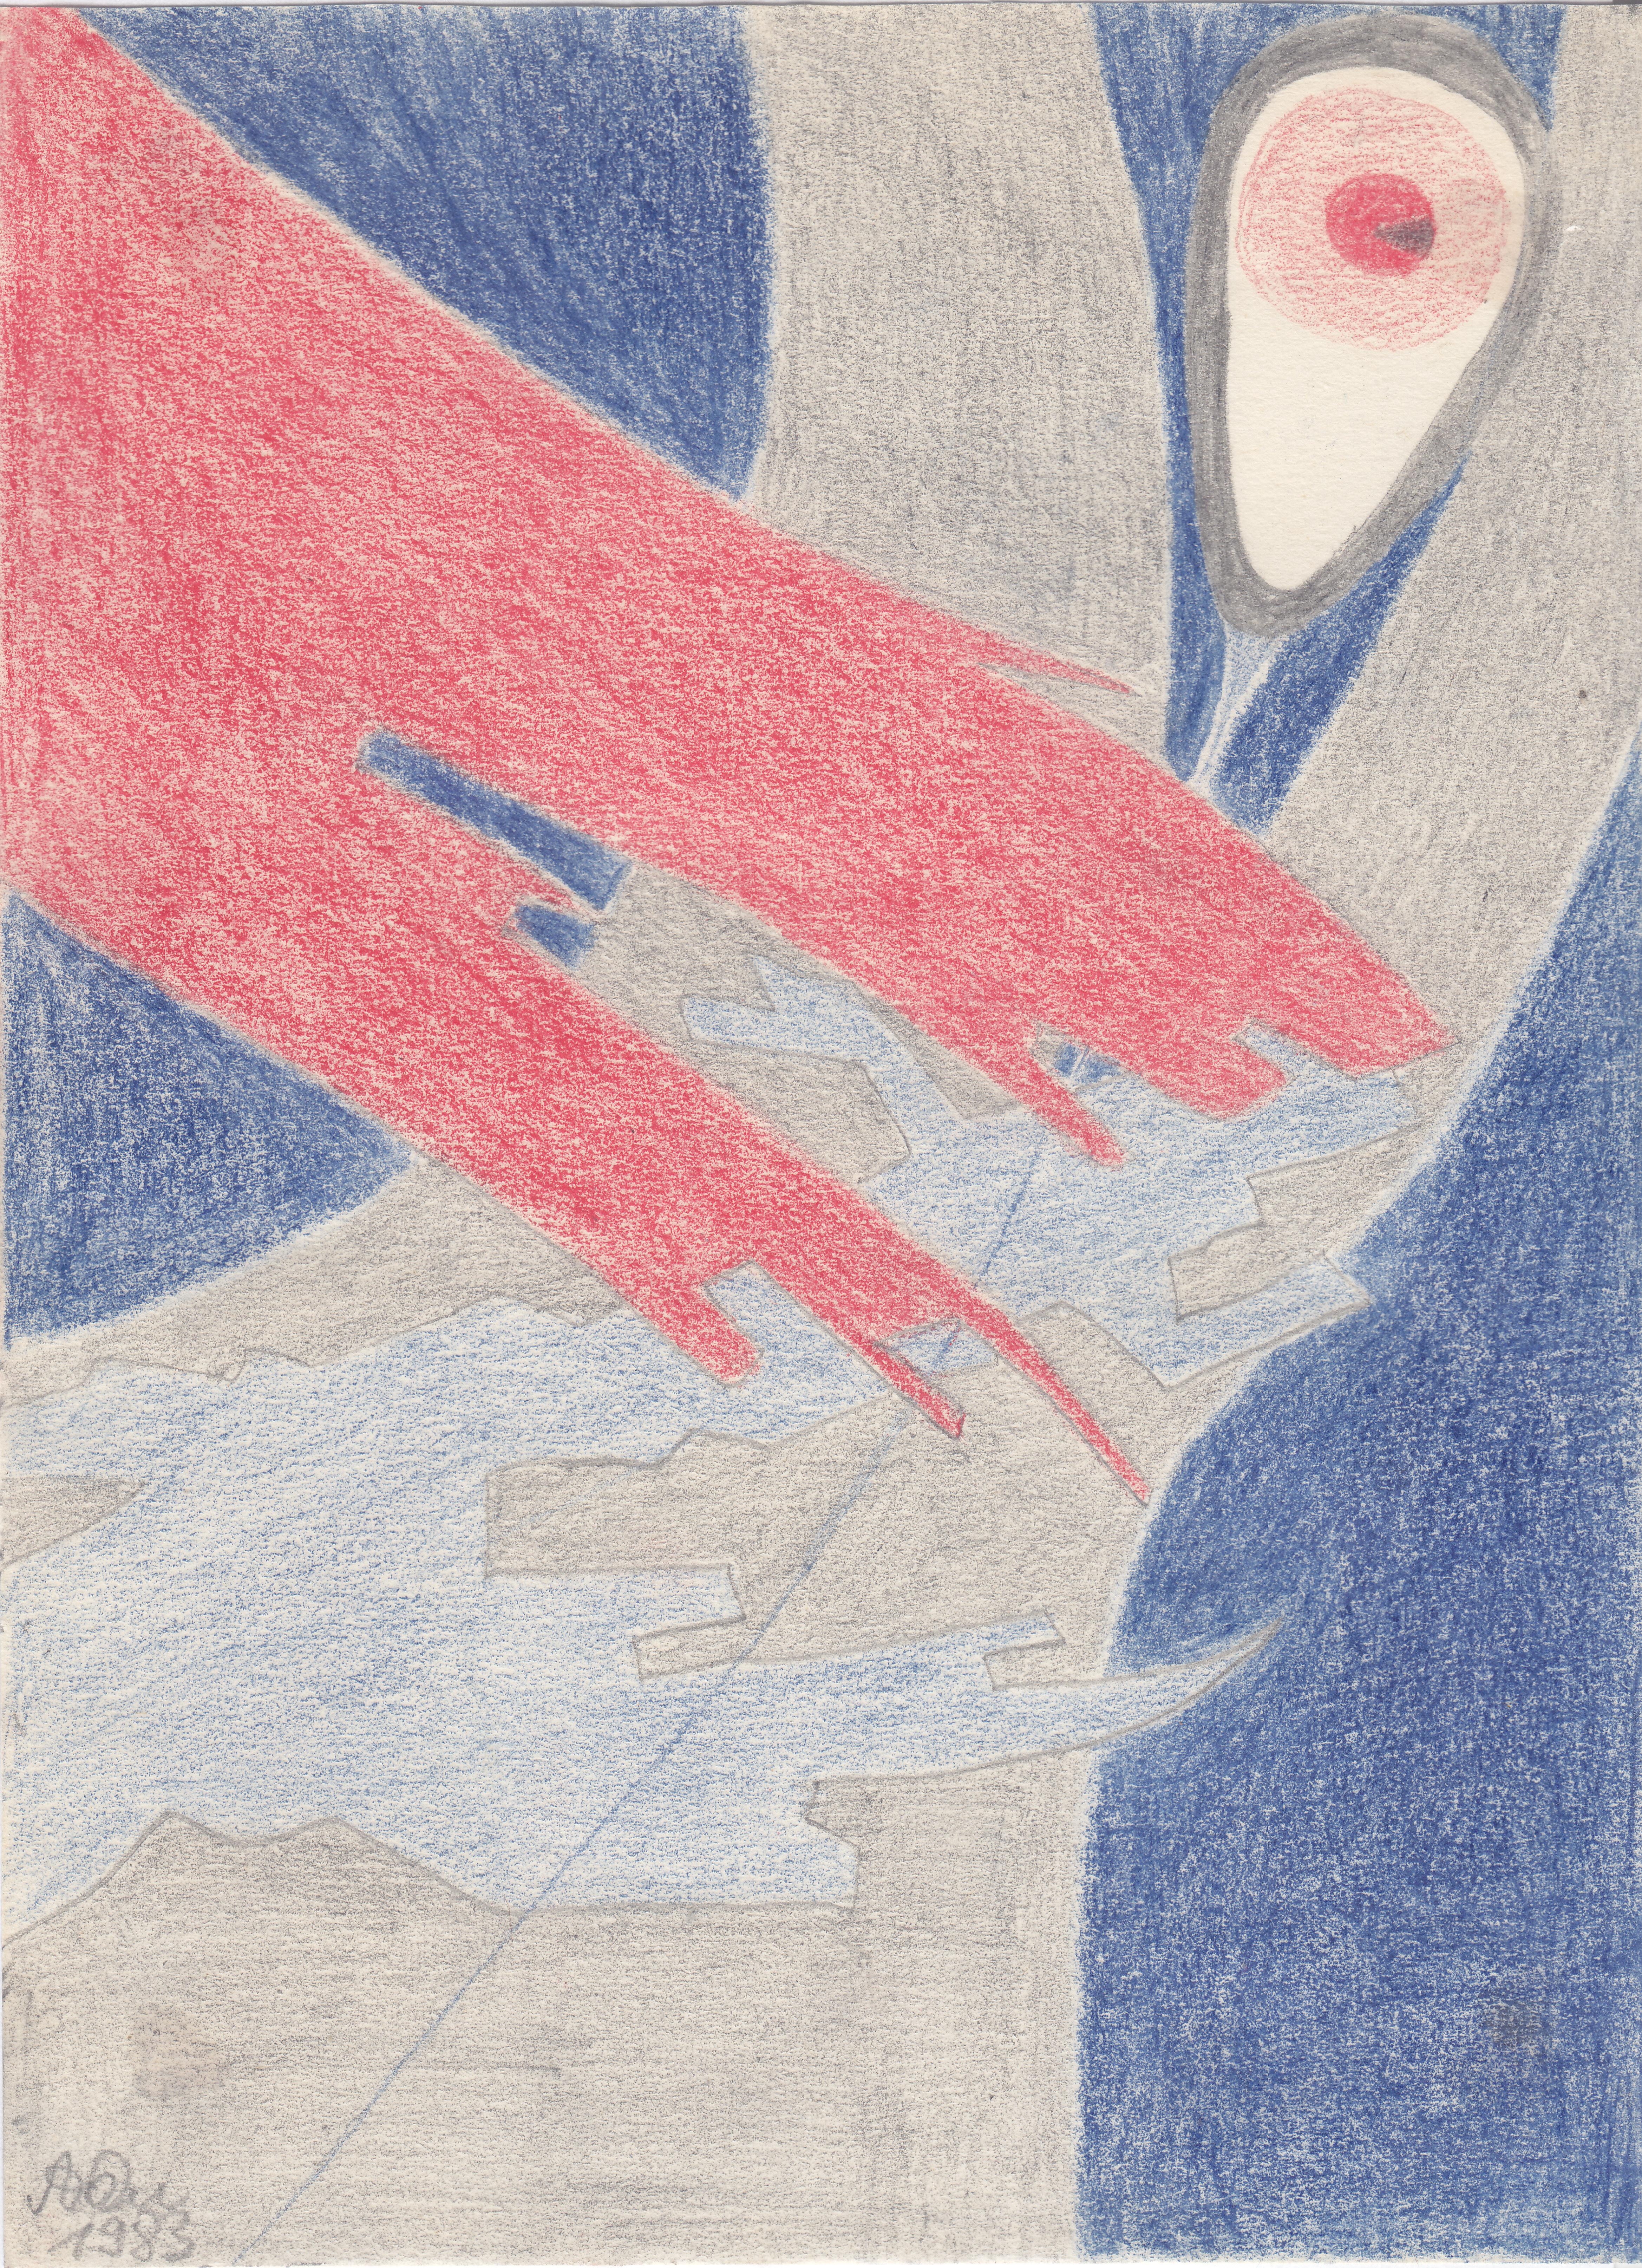 Auge am Tropf, bunt; 1983; Bleistift; imachd.